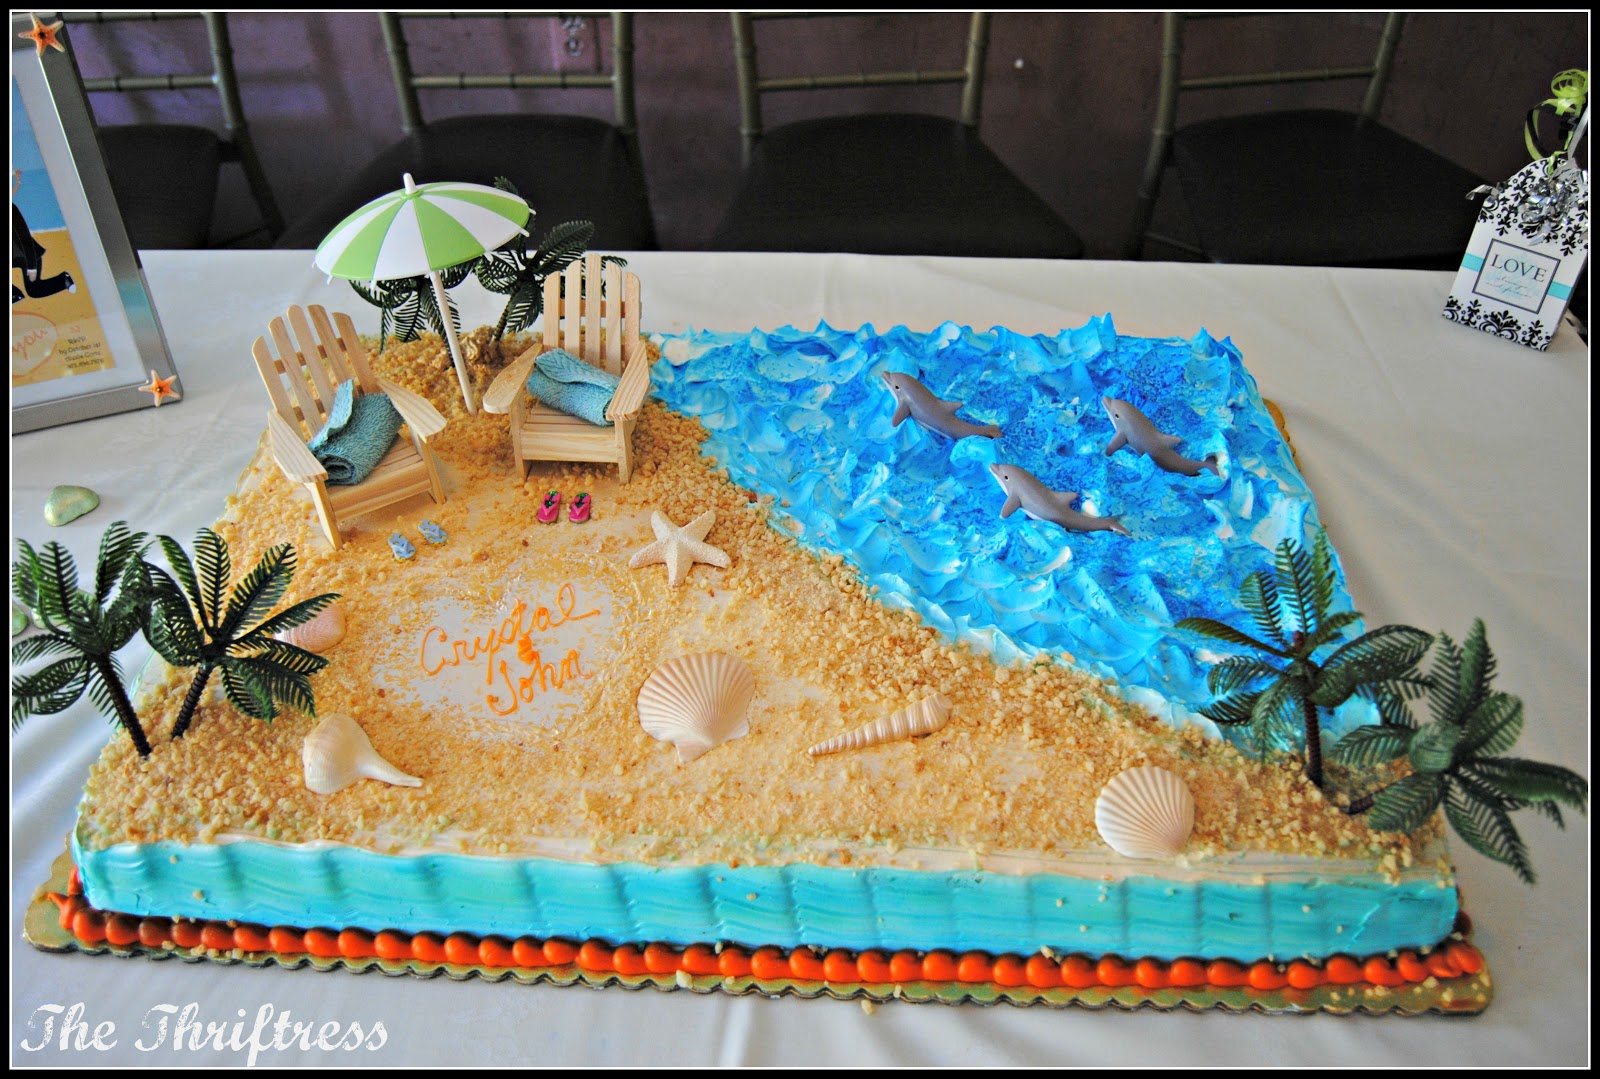 Costco Bakery Cakes Cost